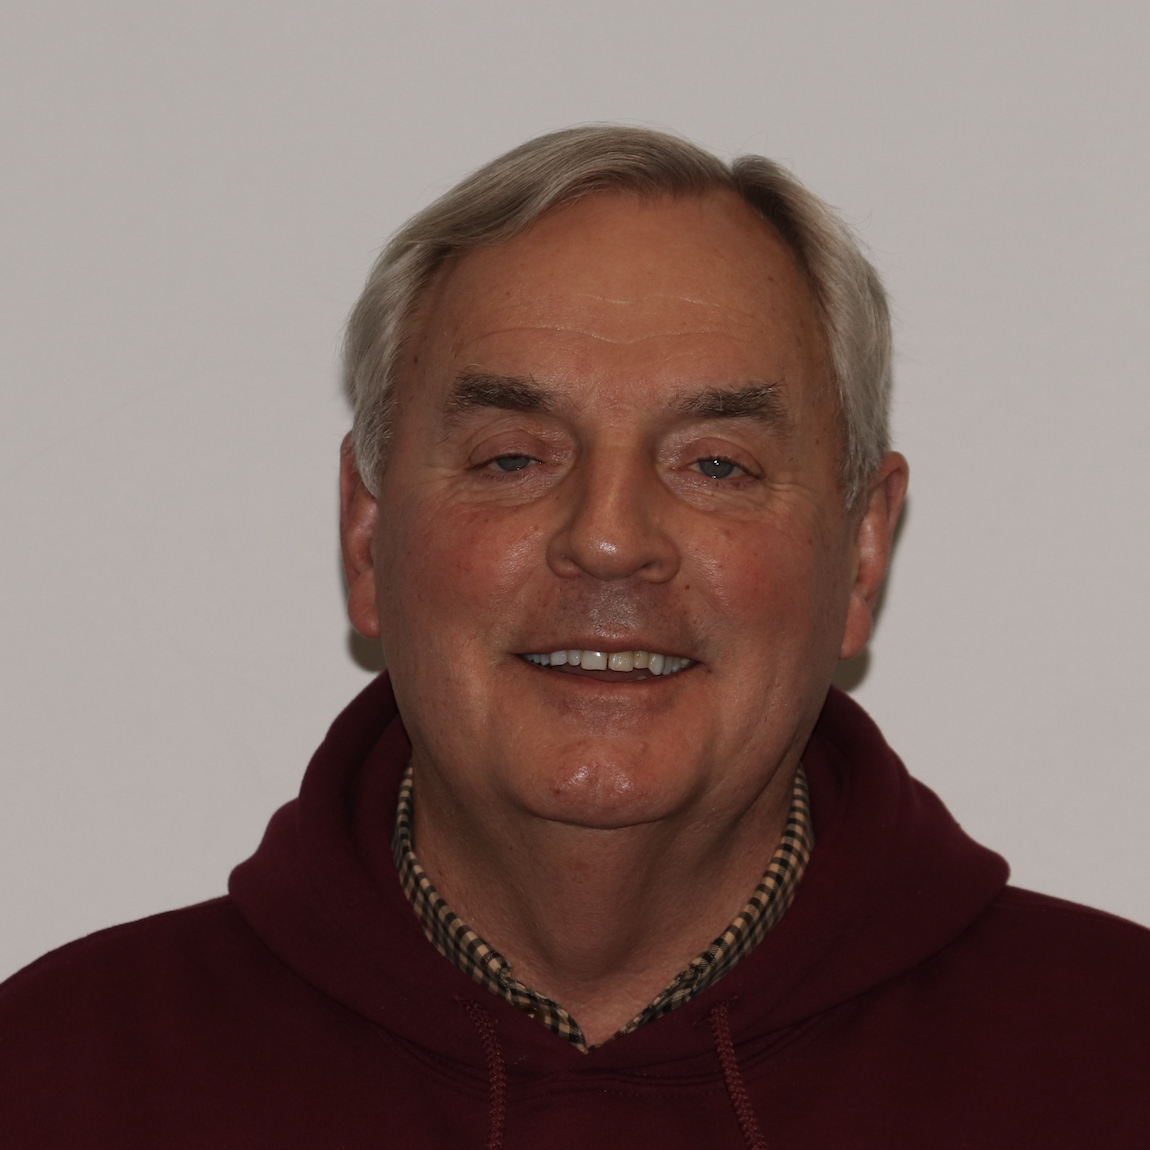 Mark G. Riggins